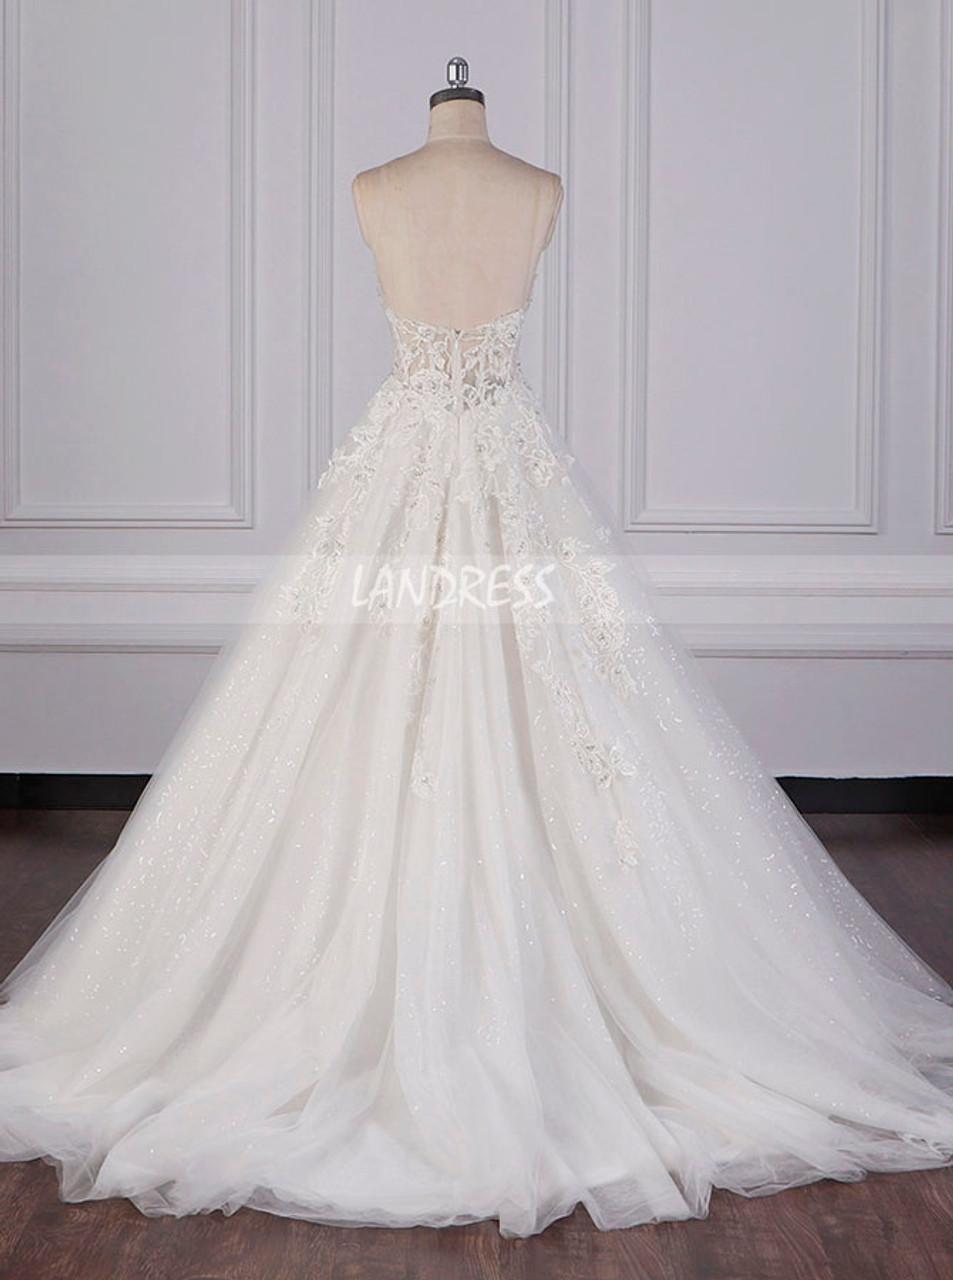 A Line Strapless Wedding Dresses Sparkly Wedding Dress 12081 Landress Co Uk,Vera Wang Wedding Dresses 2019